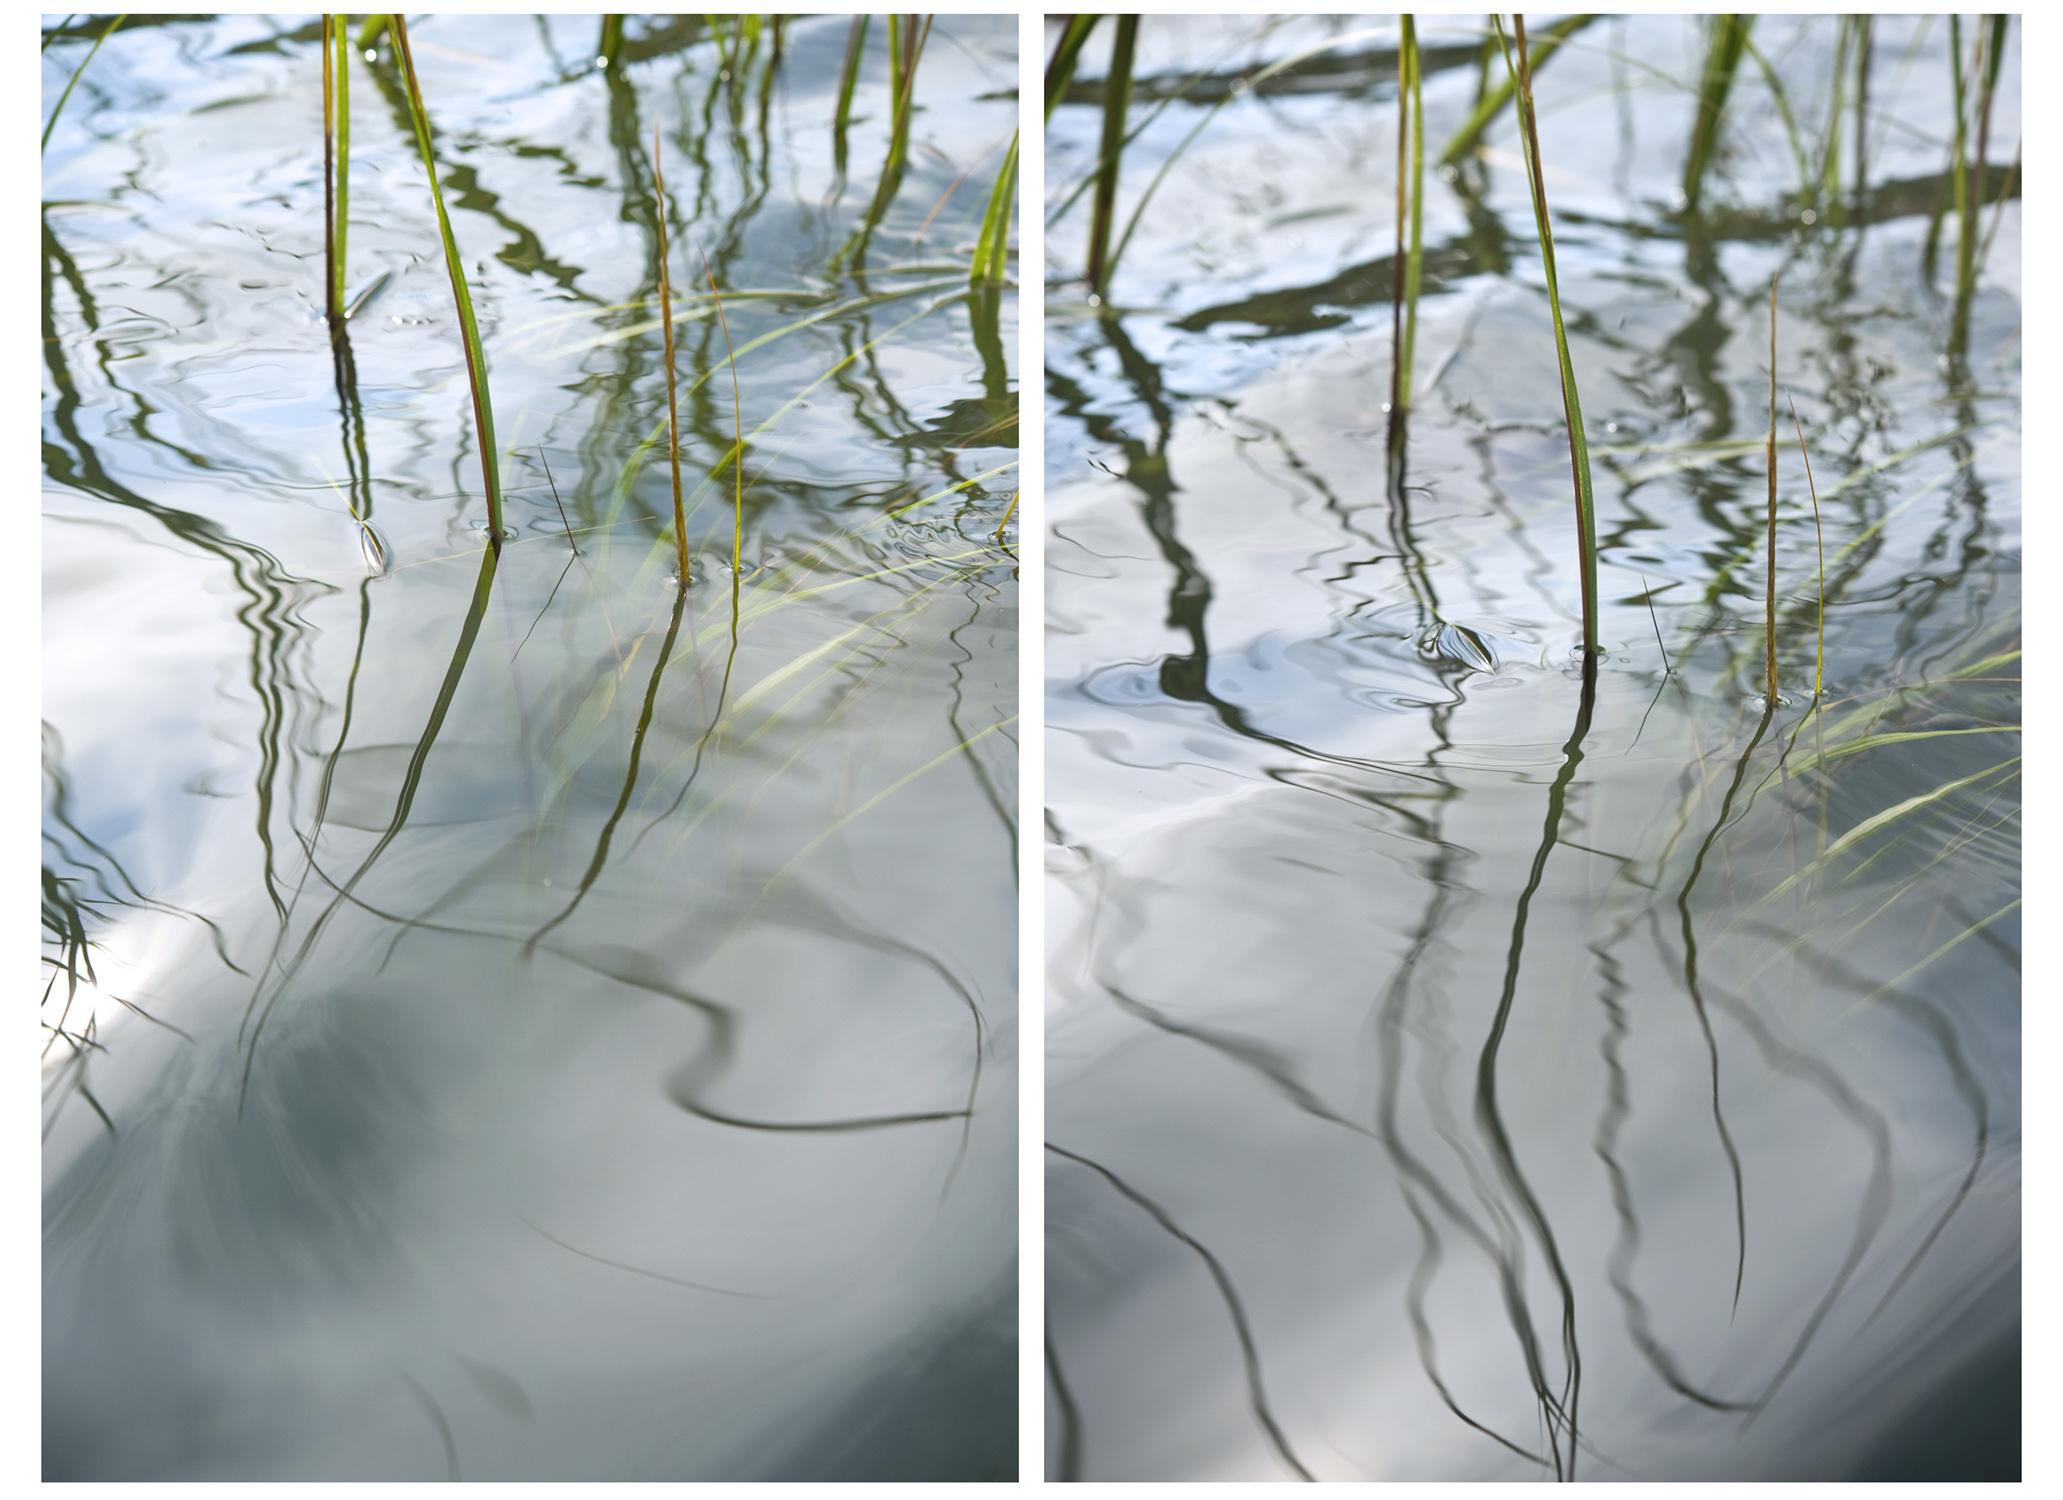 Linear Veil, 2012 (Binary Rivalry)